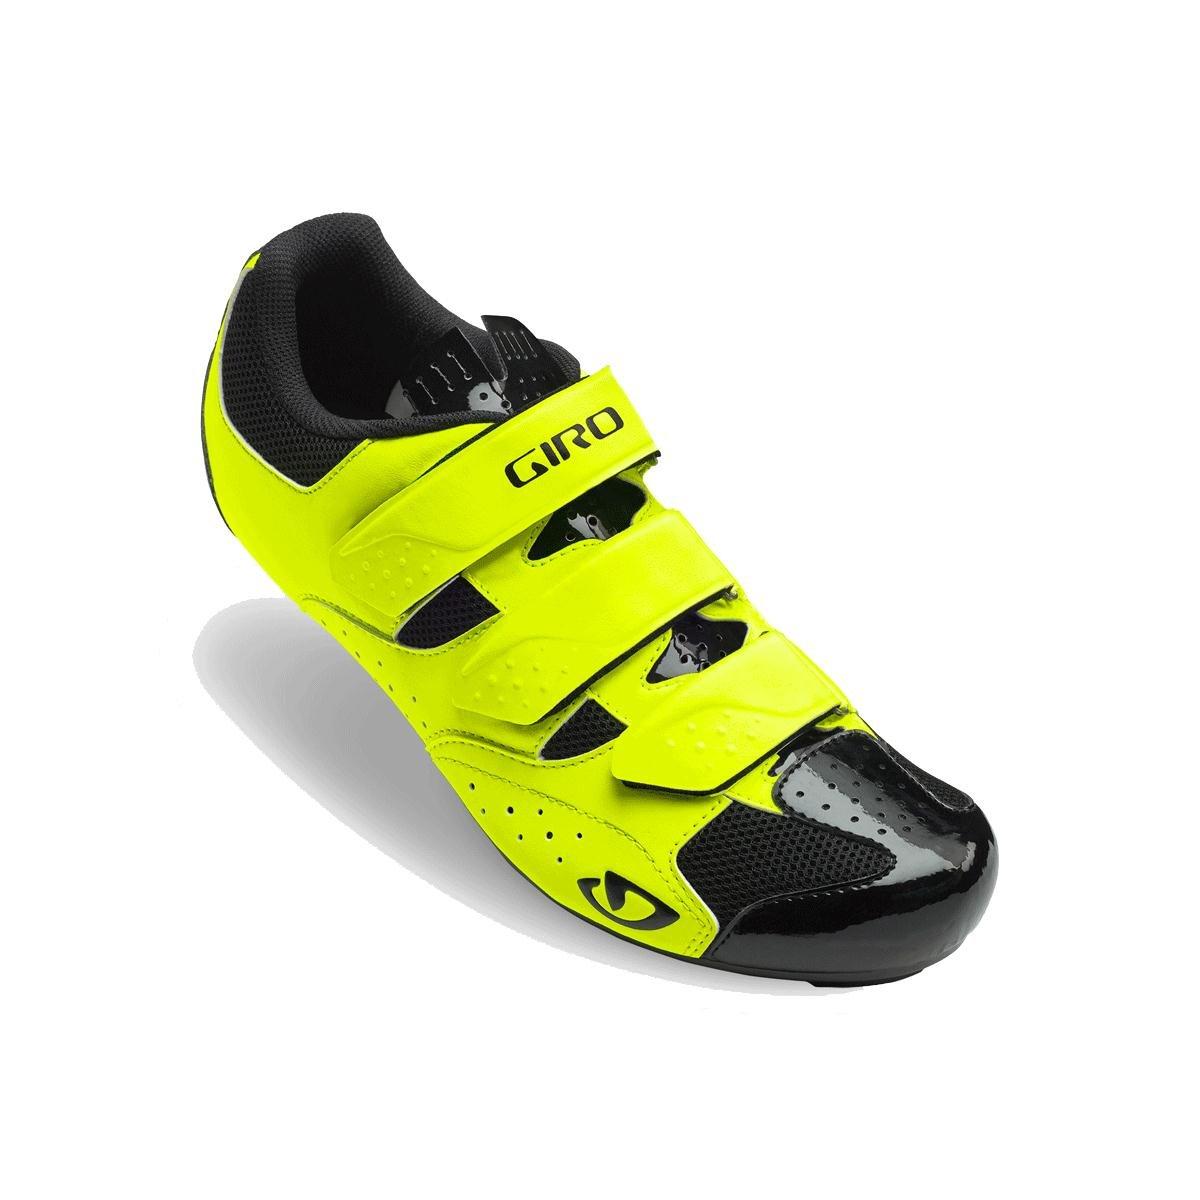 Giro Herren Techne Road Radsportschuhe, Schwarz